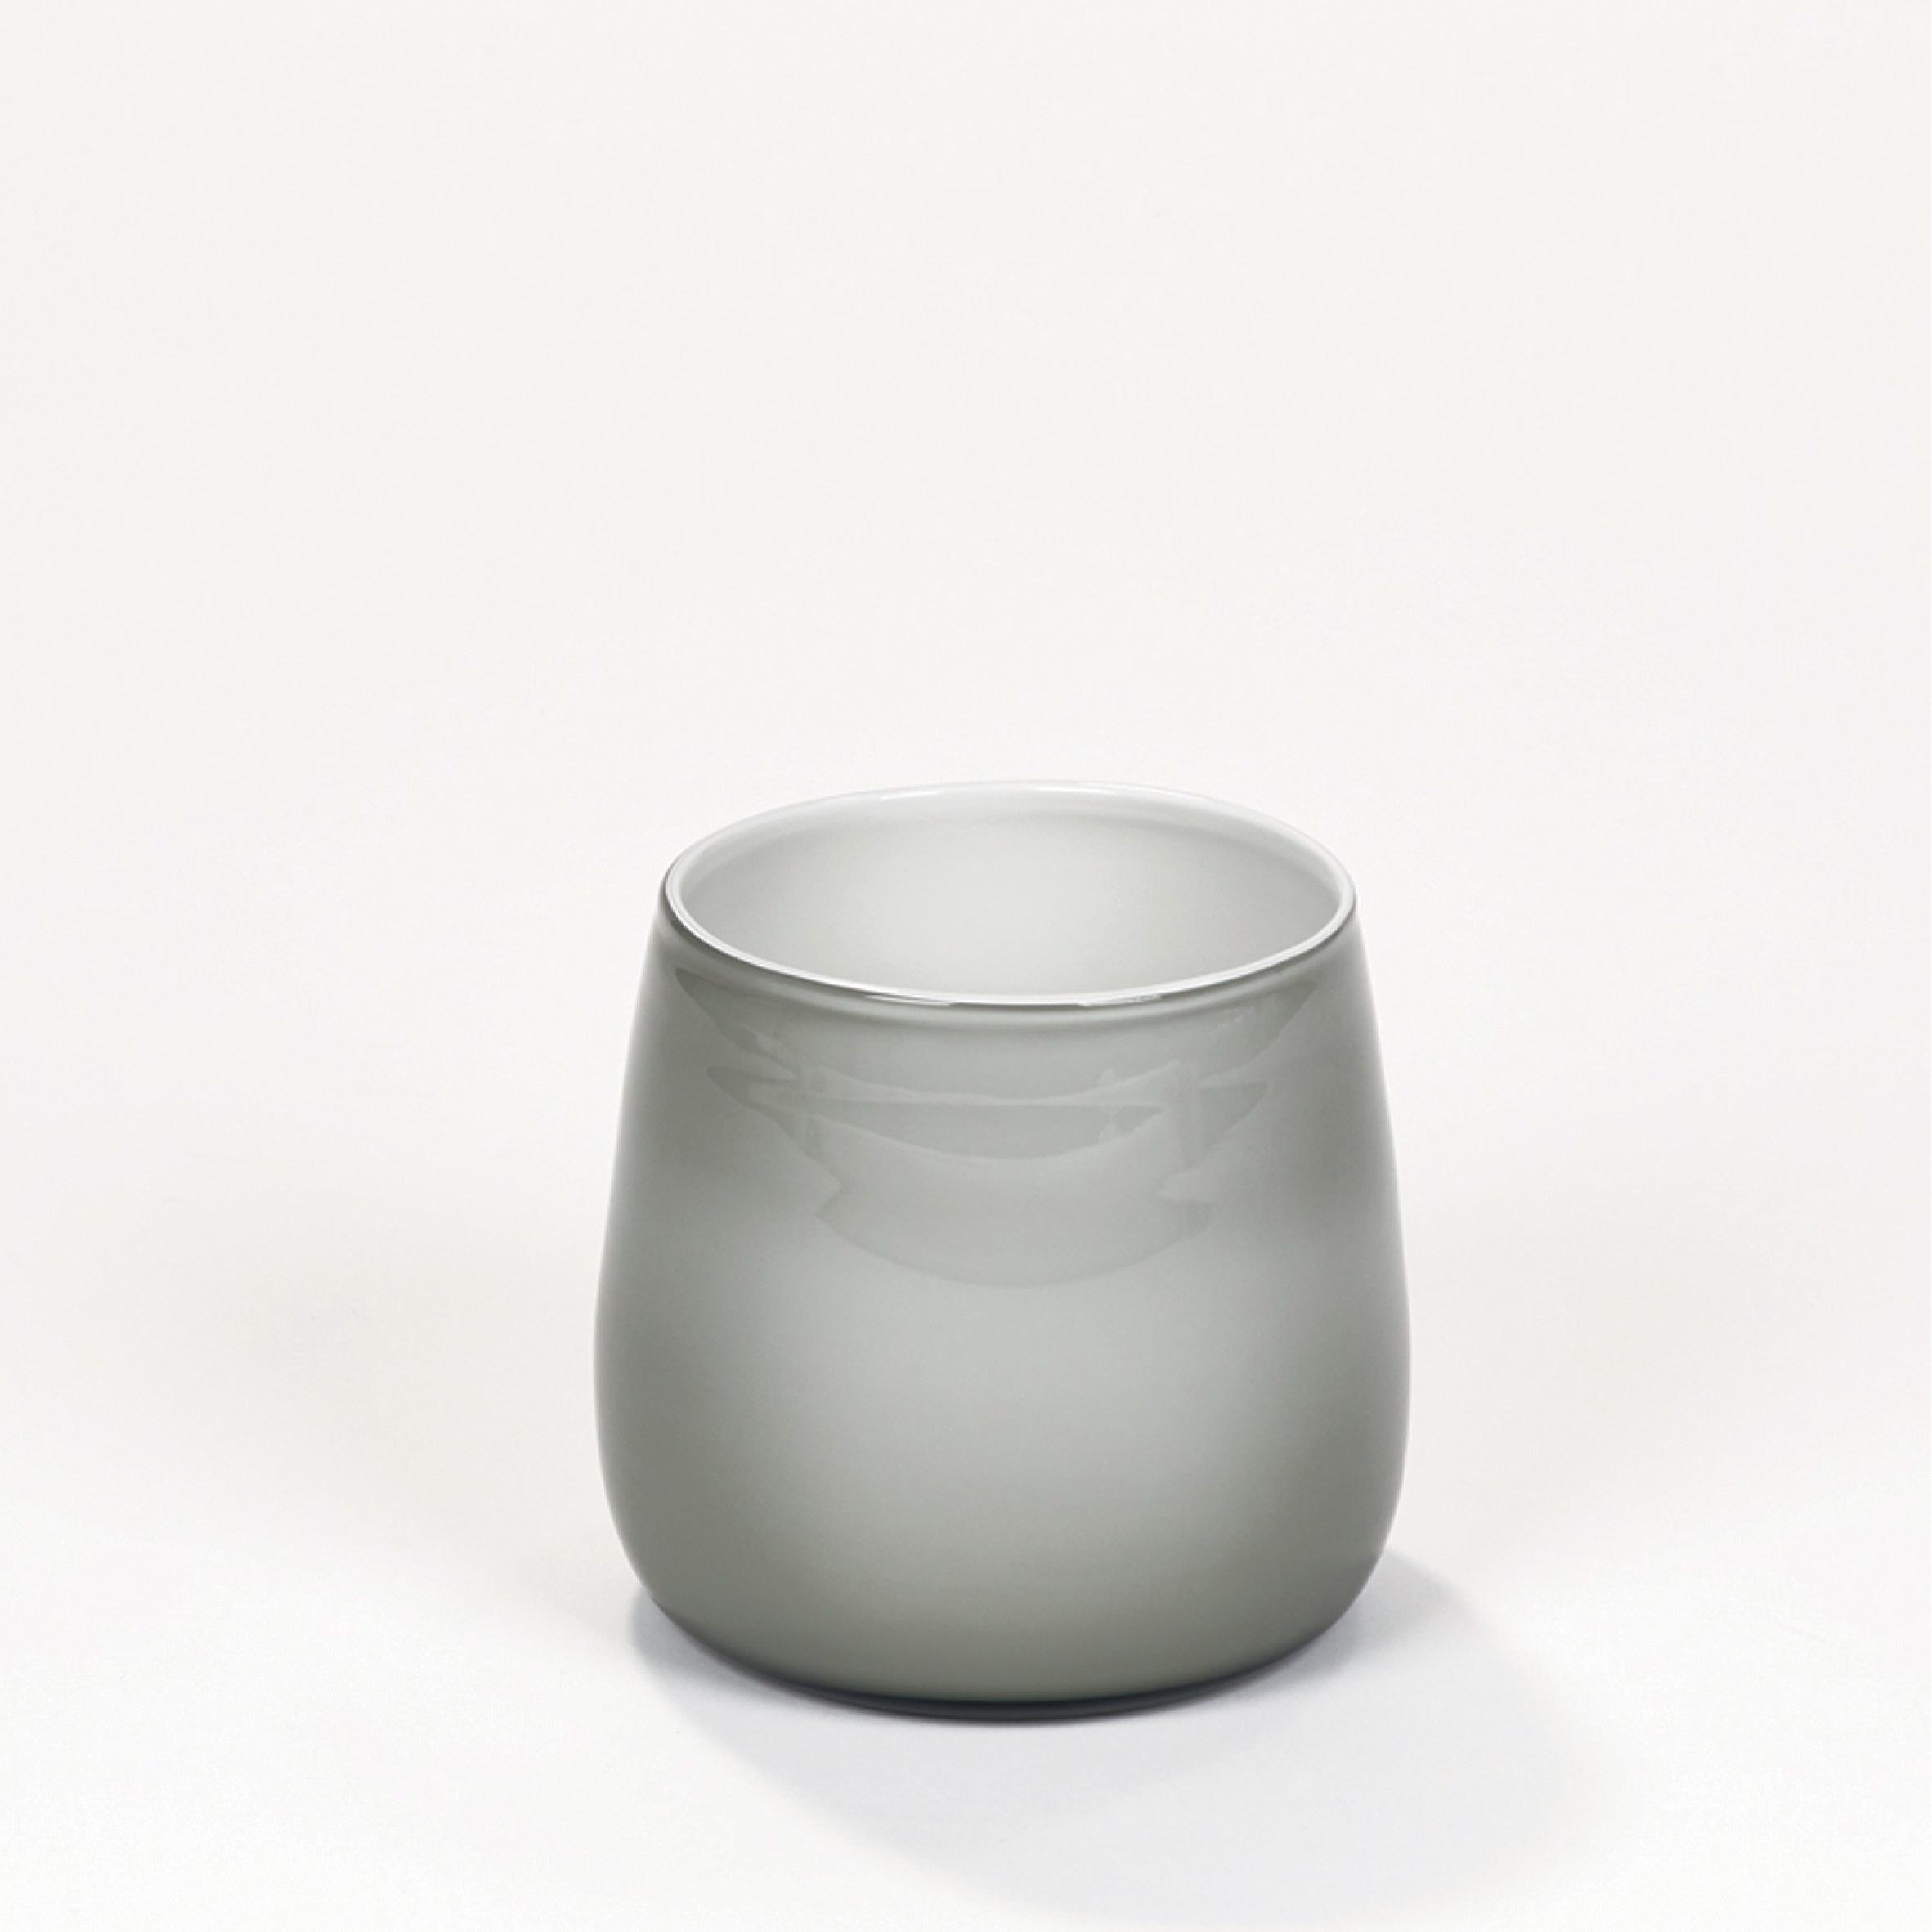 lambert pisano vase platin klein lambert querpass shop. Black Bedroom Furniture Sets. Home Design Ideas